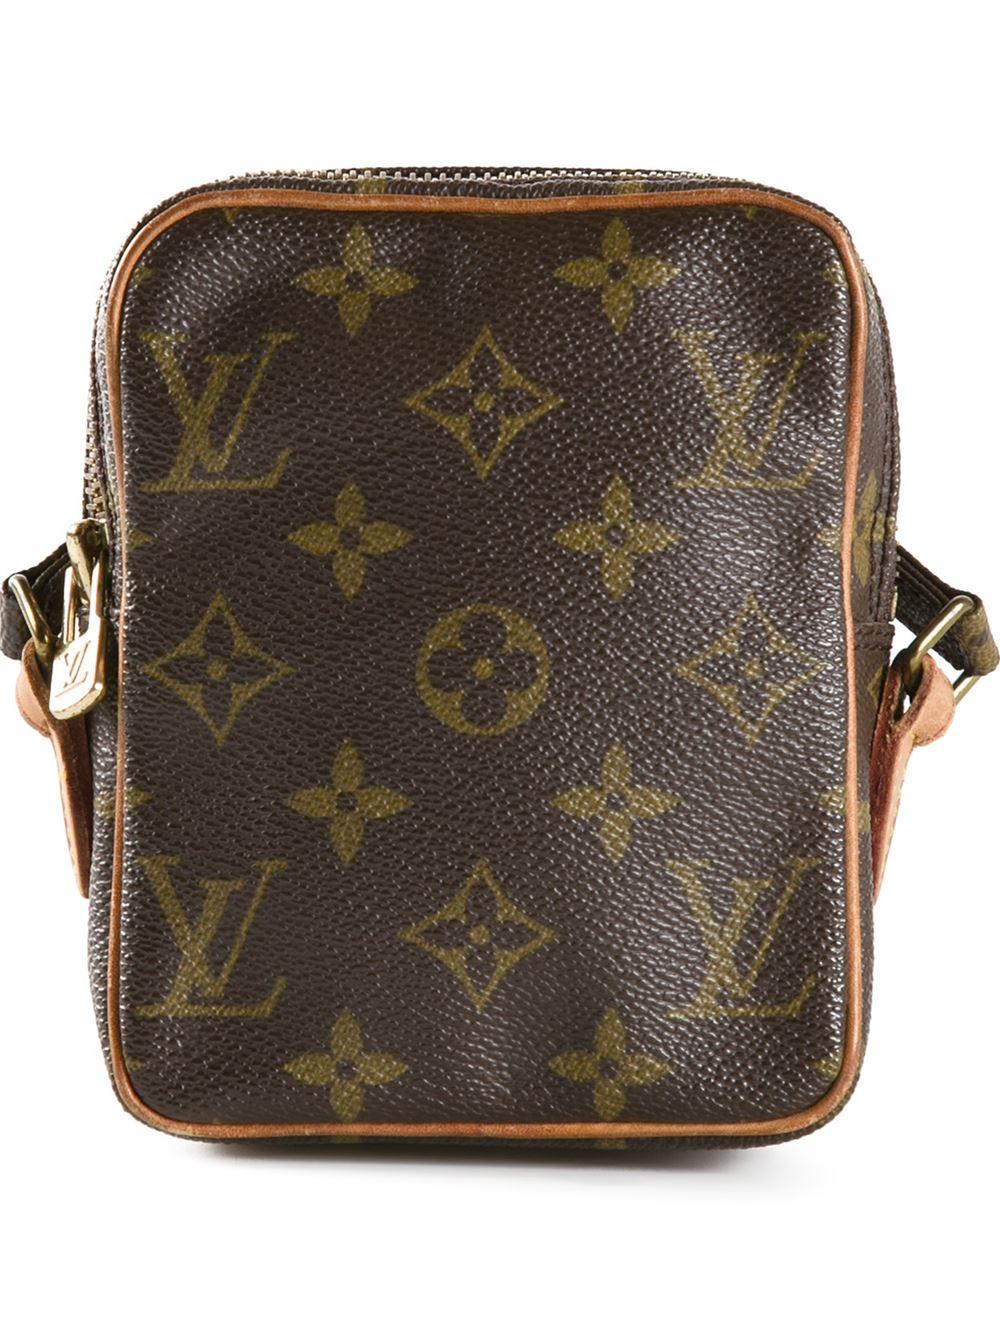 b17f3e77eca2 Louis Vuitton Small Shoulder Purse - Best Purse Image Ccdbb.Org